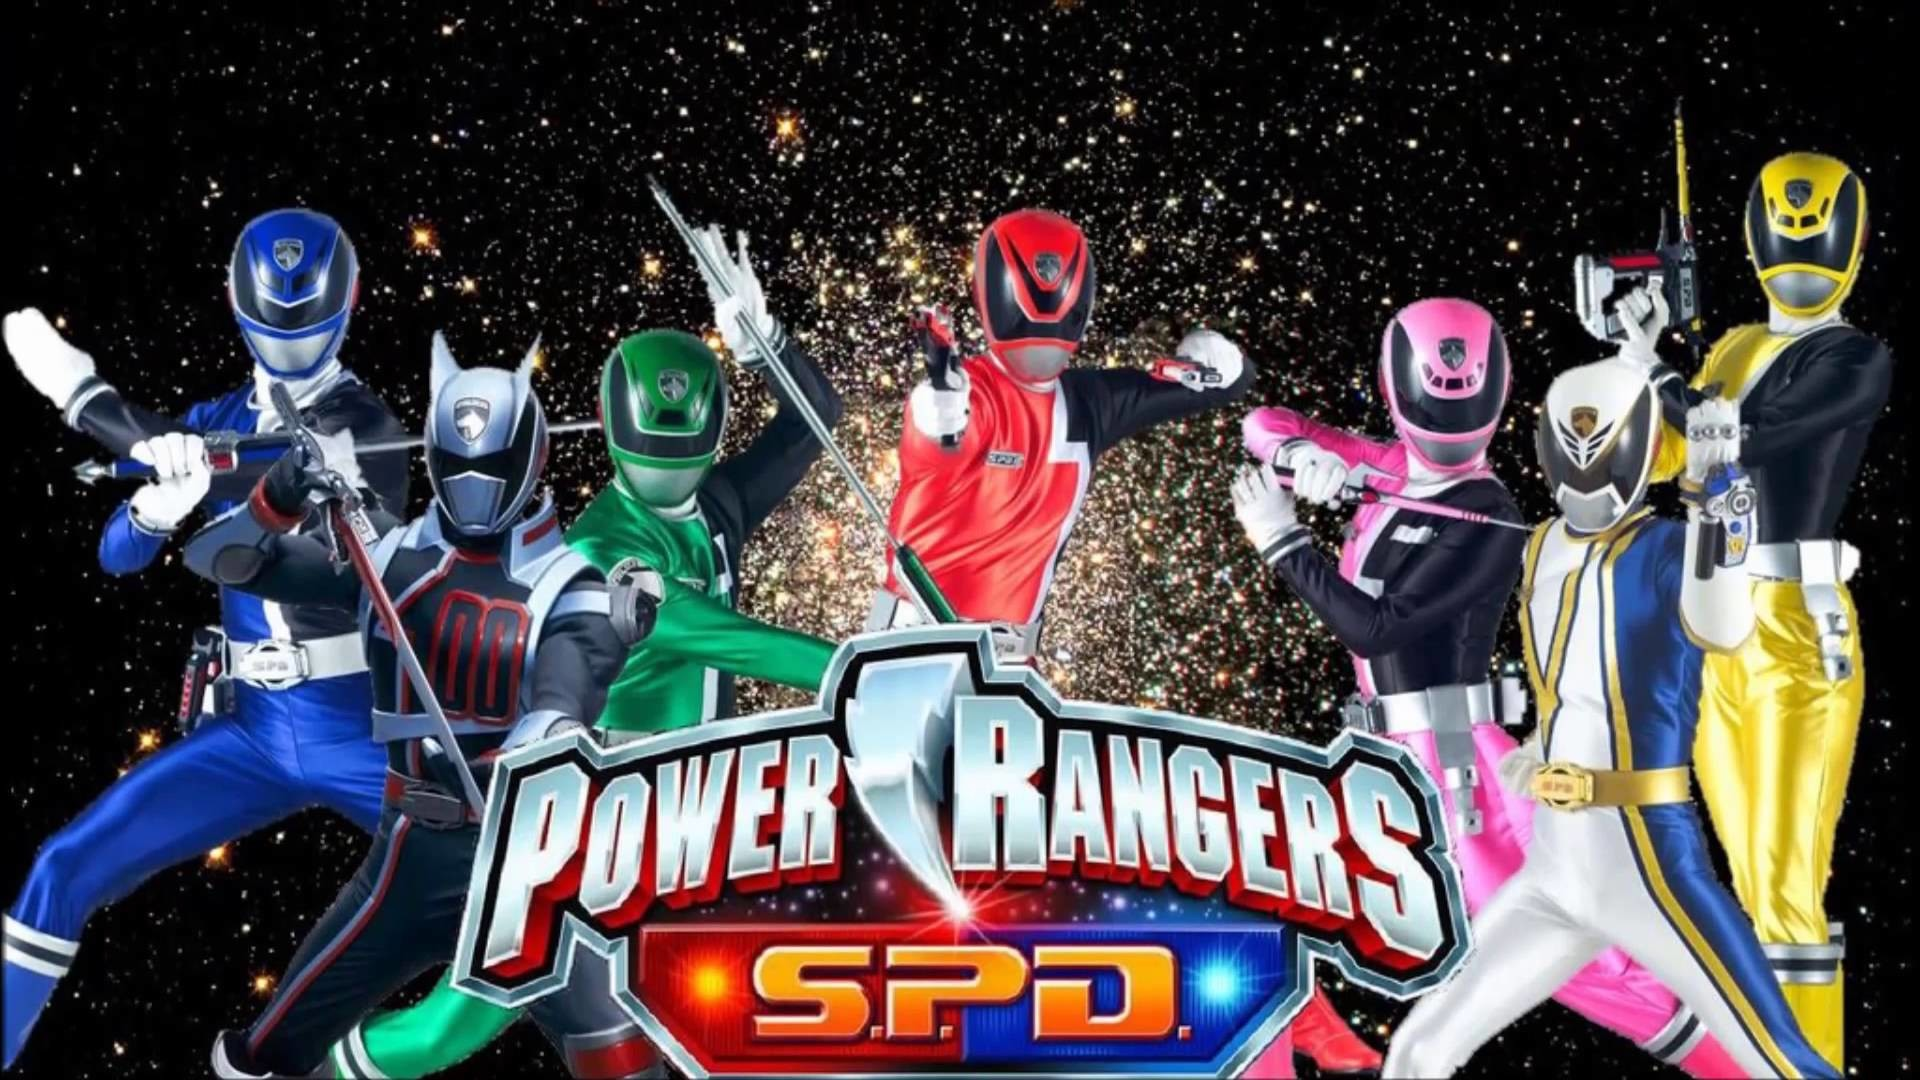 Power Ranger Megaforce Wallpaper Posted By Ryan Simpson